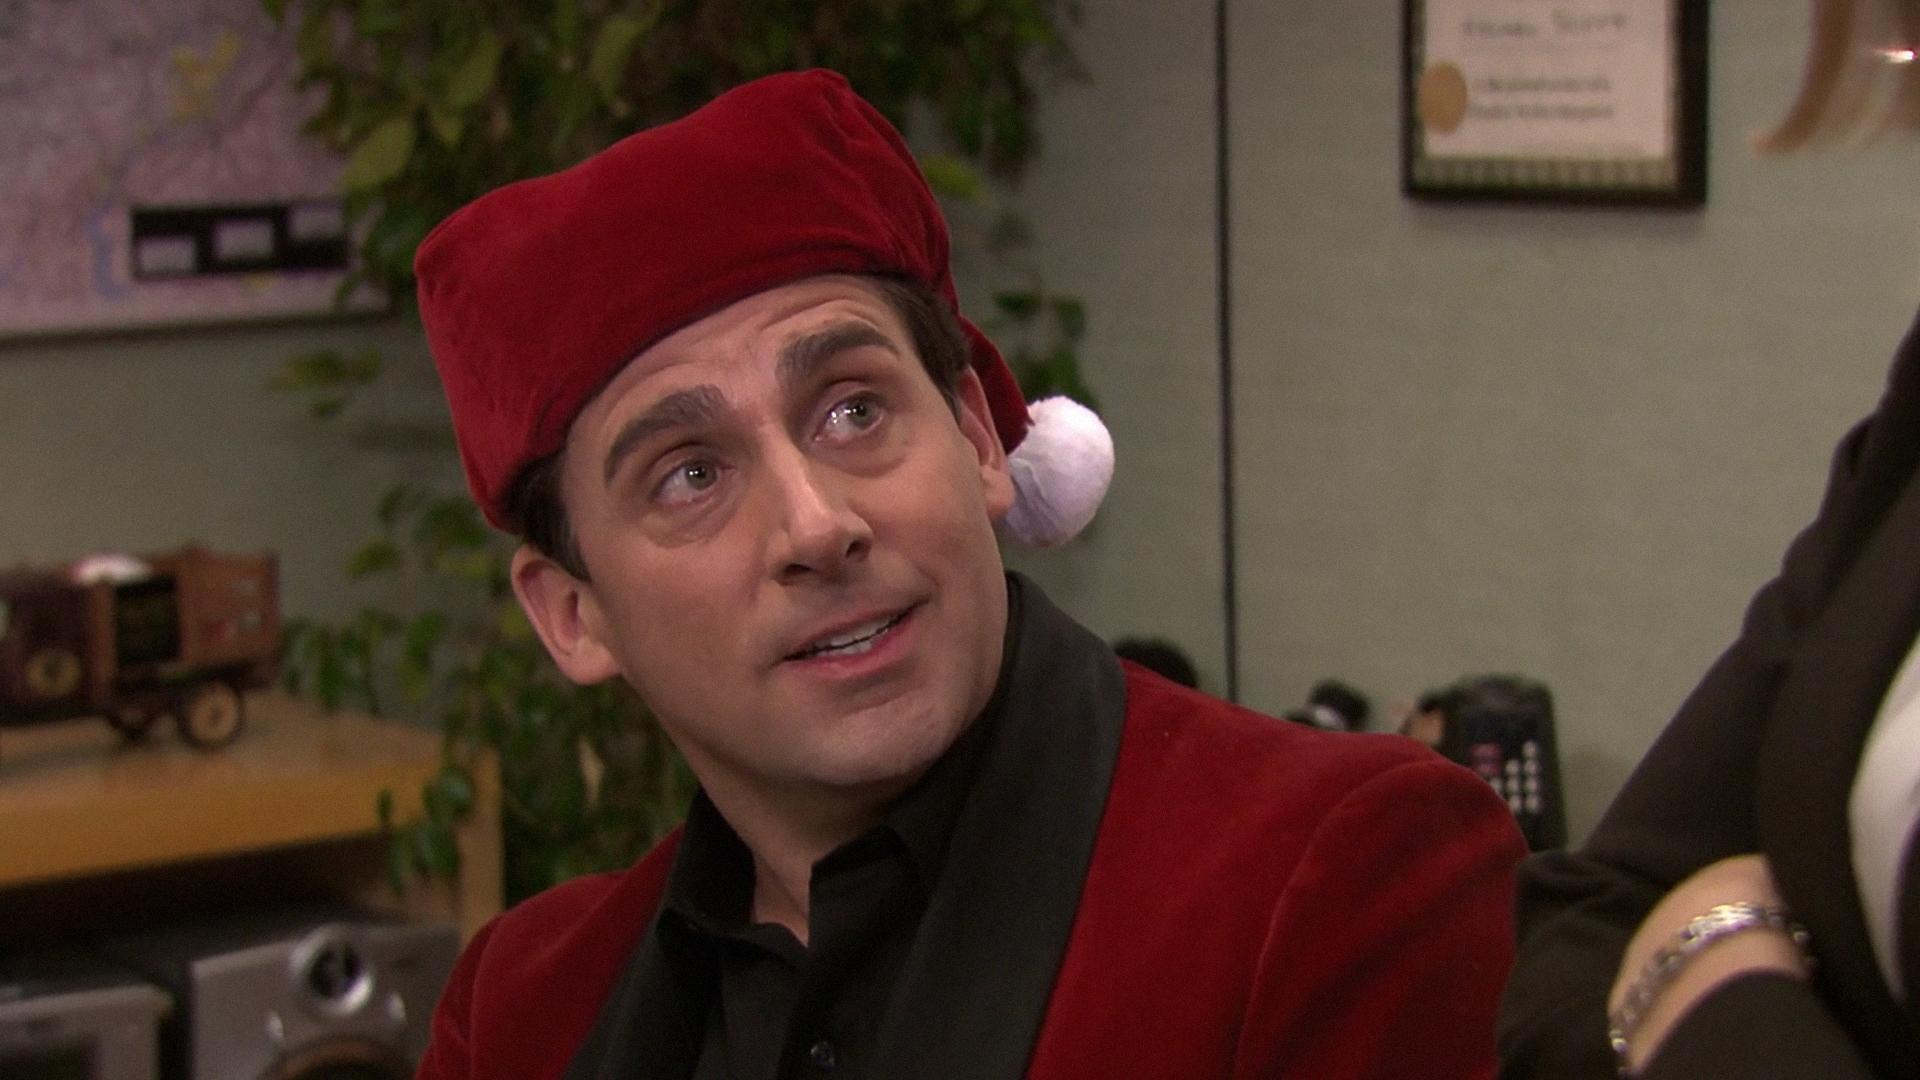 Classy Christmas Part 2